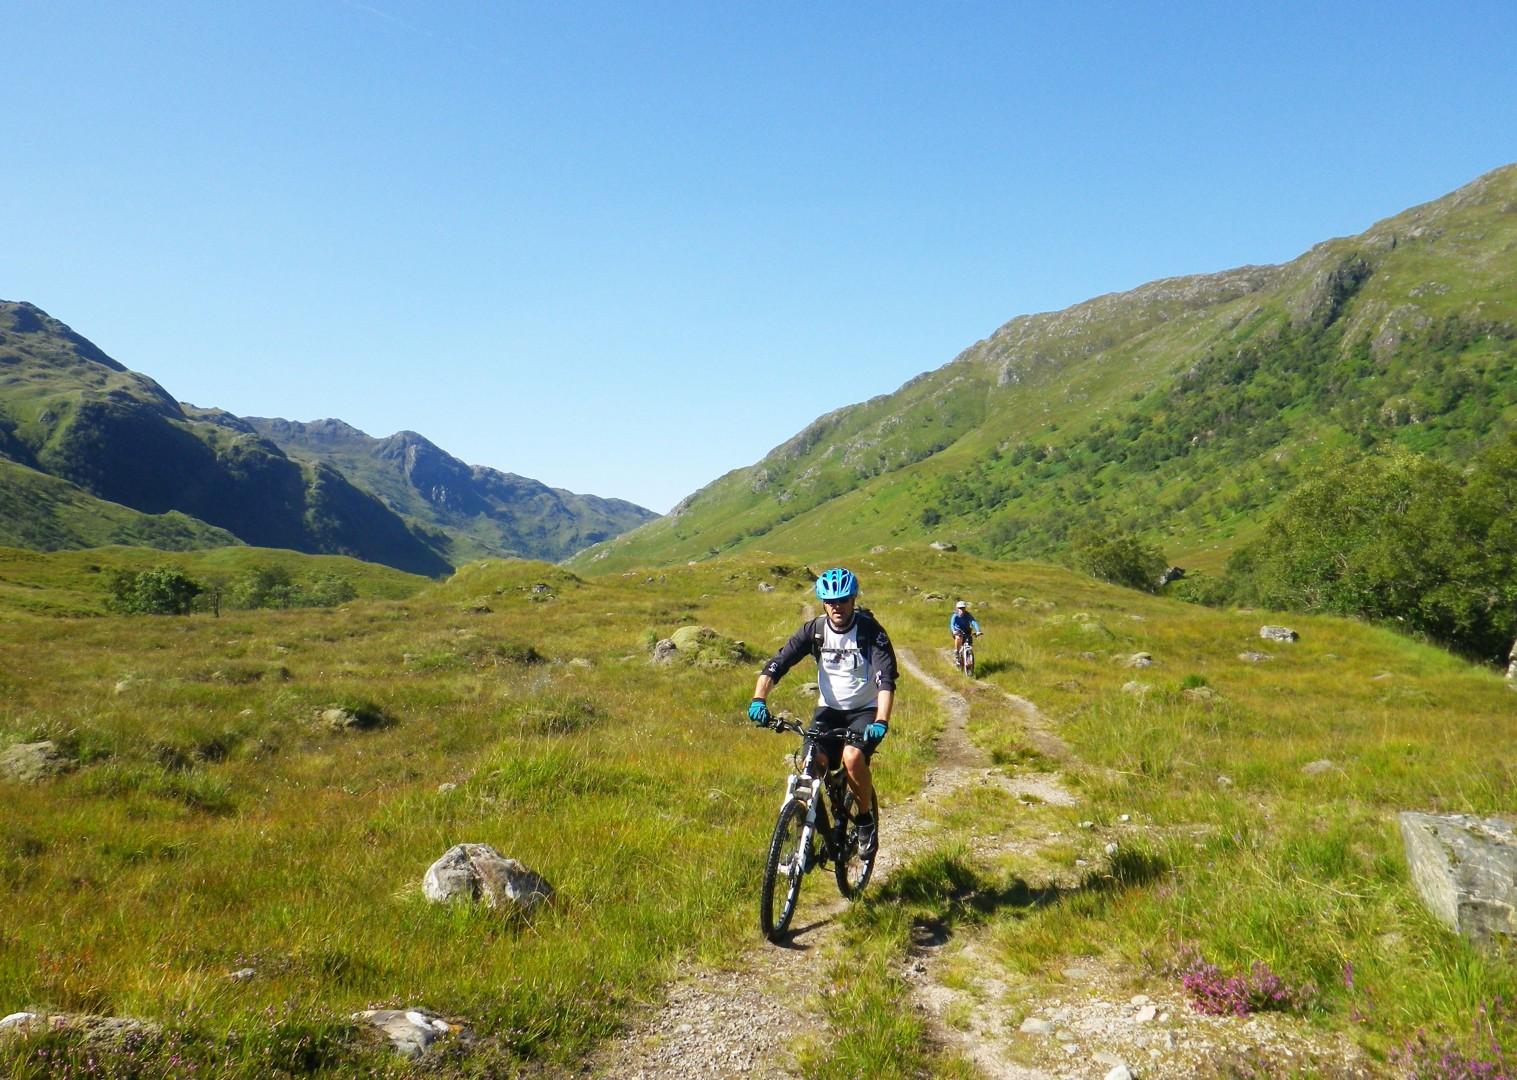 scenic-highlands-coast-to-coast-cycling-adventure.jpg - Scotland - Celtic Crossing - Guided Mountain Bike Holiday - Mountain Biking